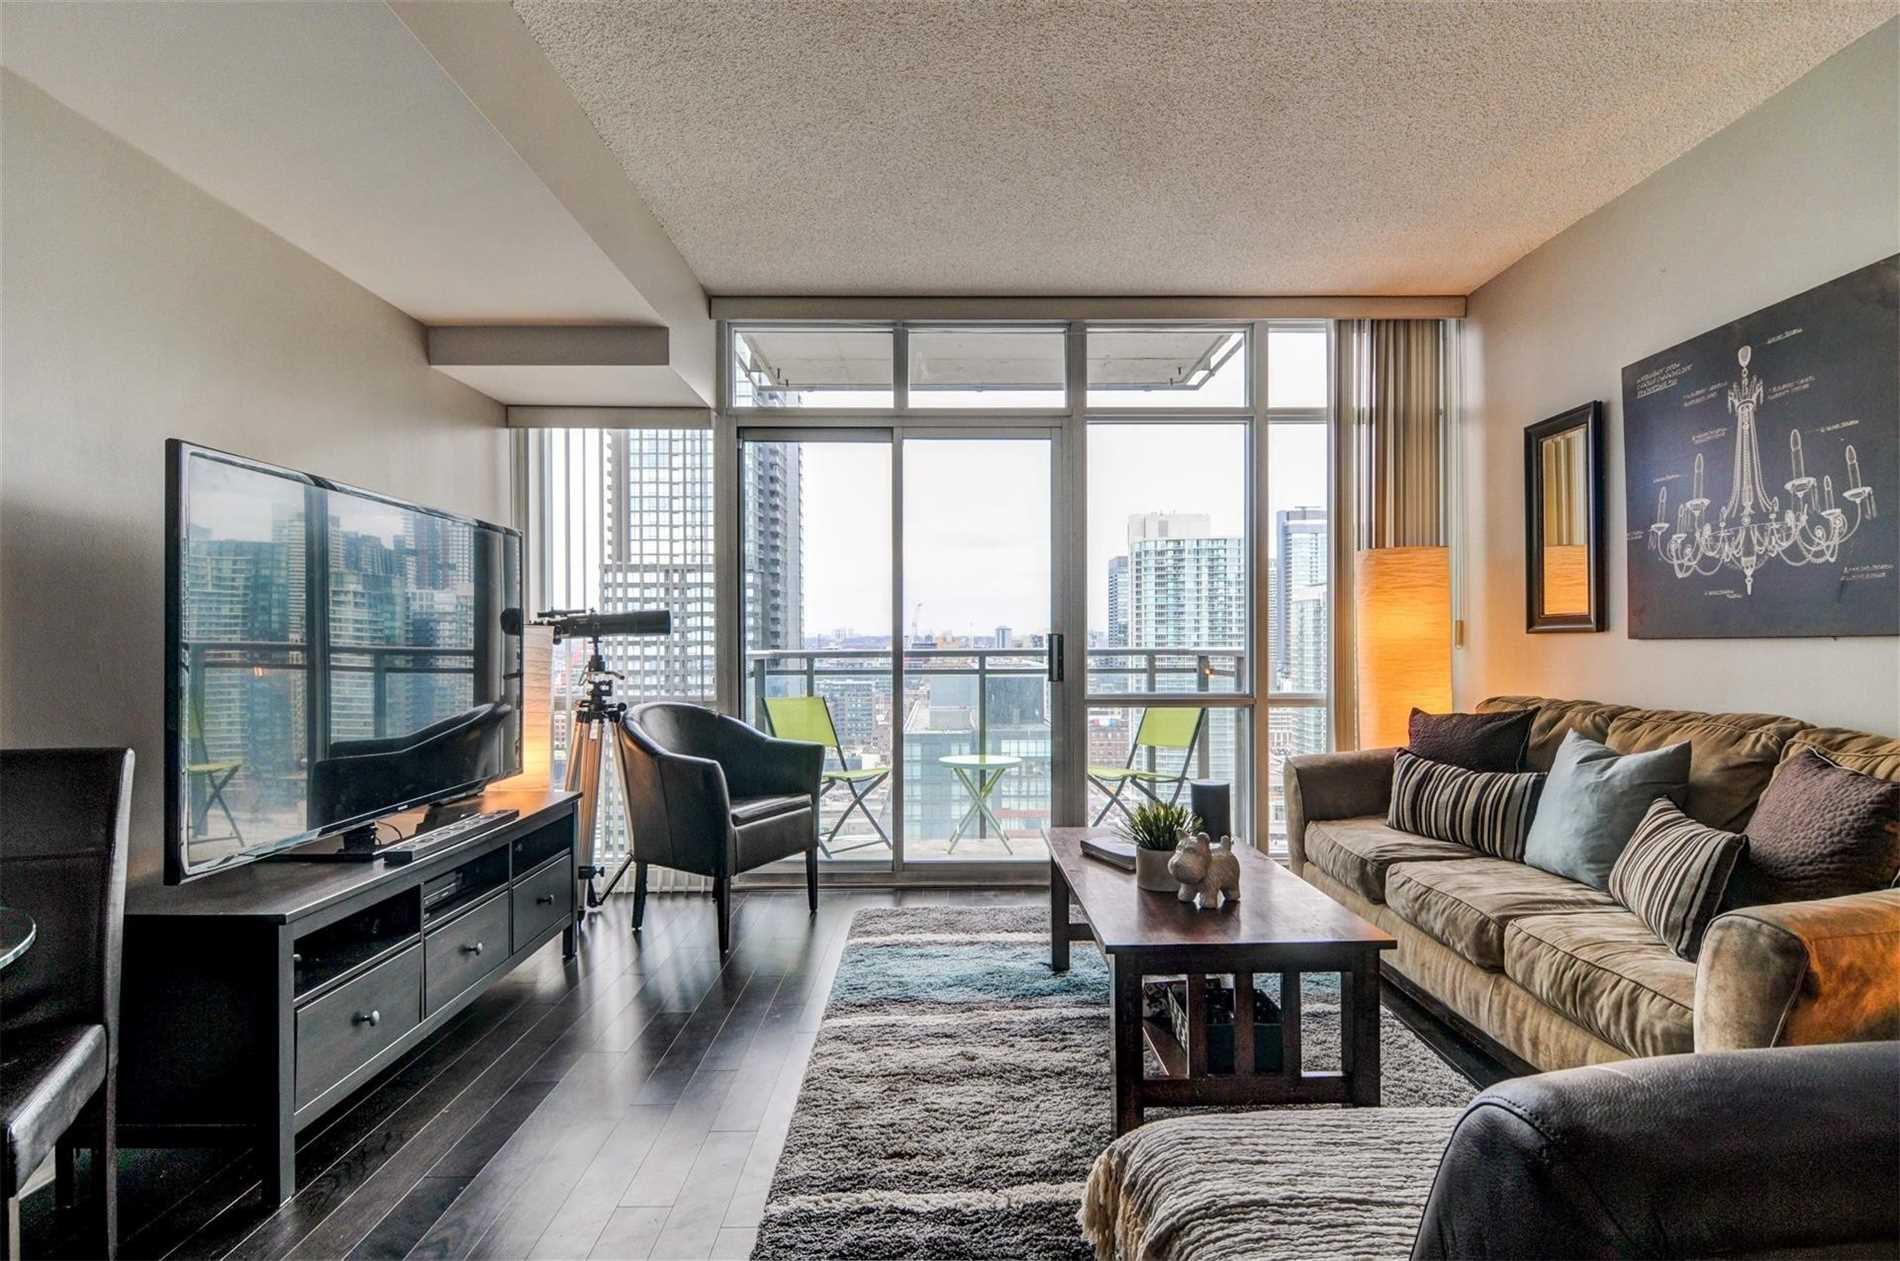 Main Photo: 2805 11 Brunel Court in Toronto: Waterfront Communities C1 Condo for sale (Toronto C01)  : MLS®# C4381555